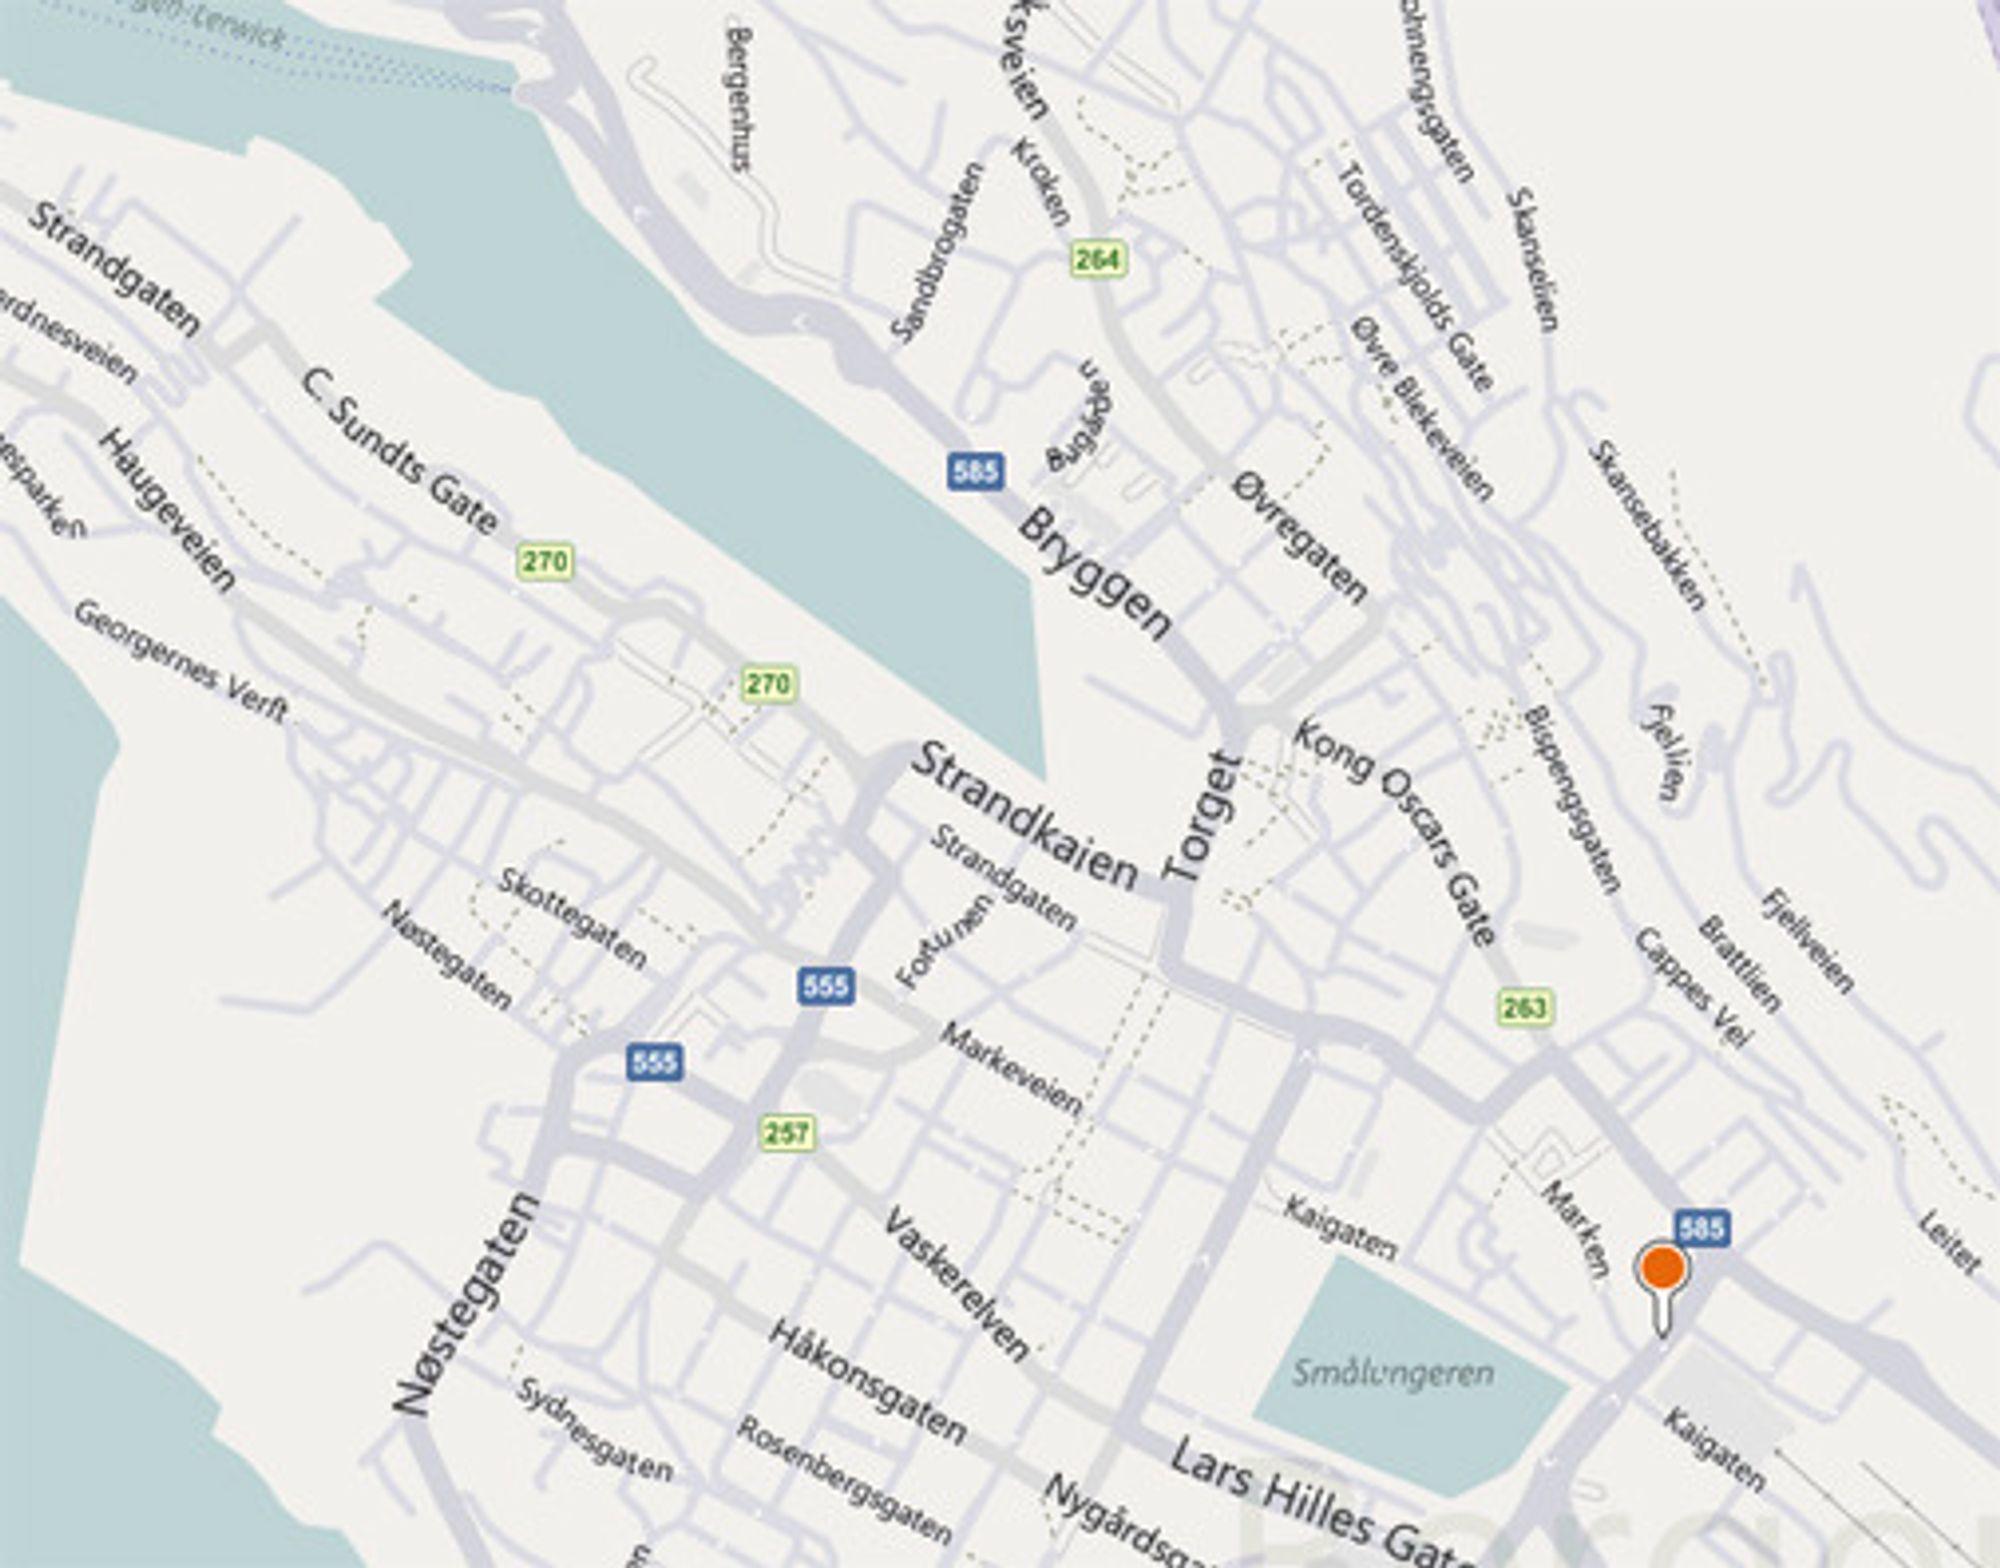 Bergen by er langt mindre detaljert i Microsofts vanlige Bing-kart.